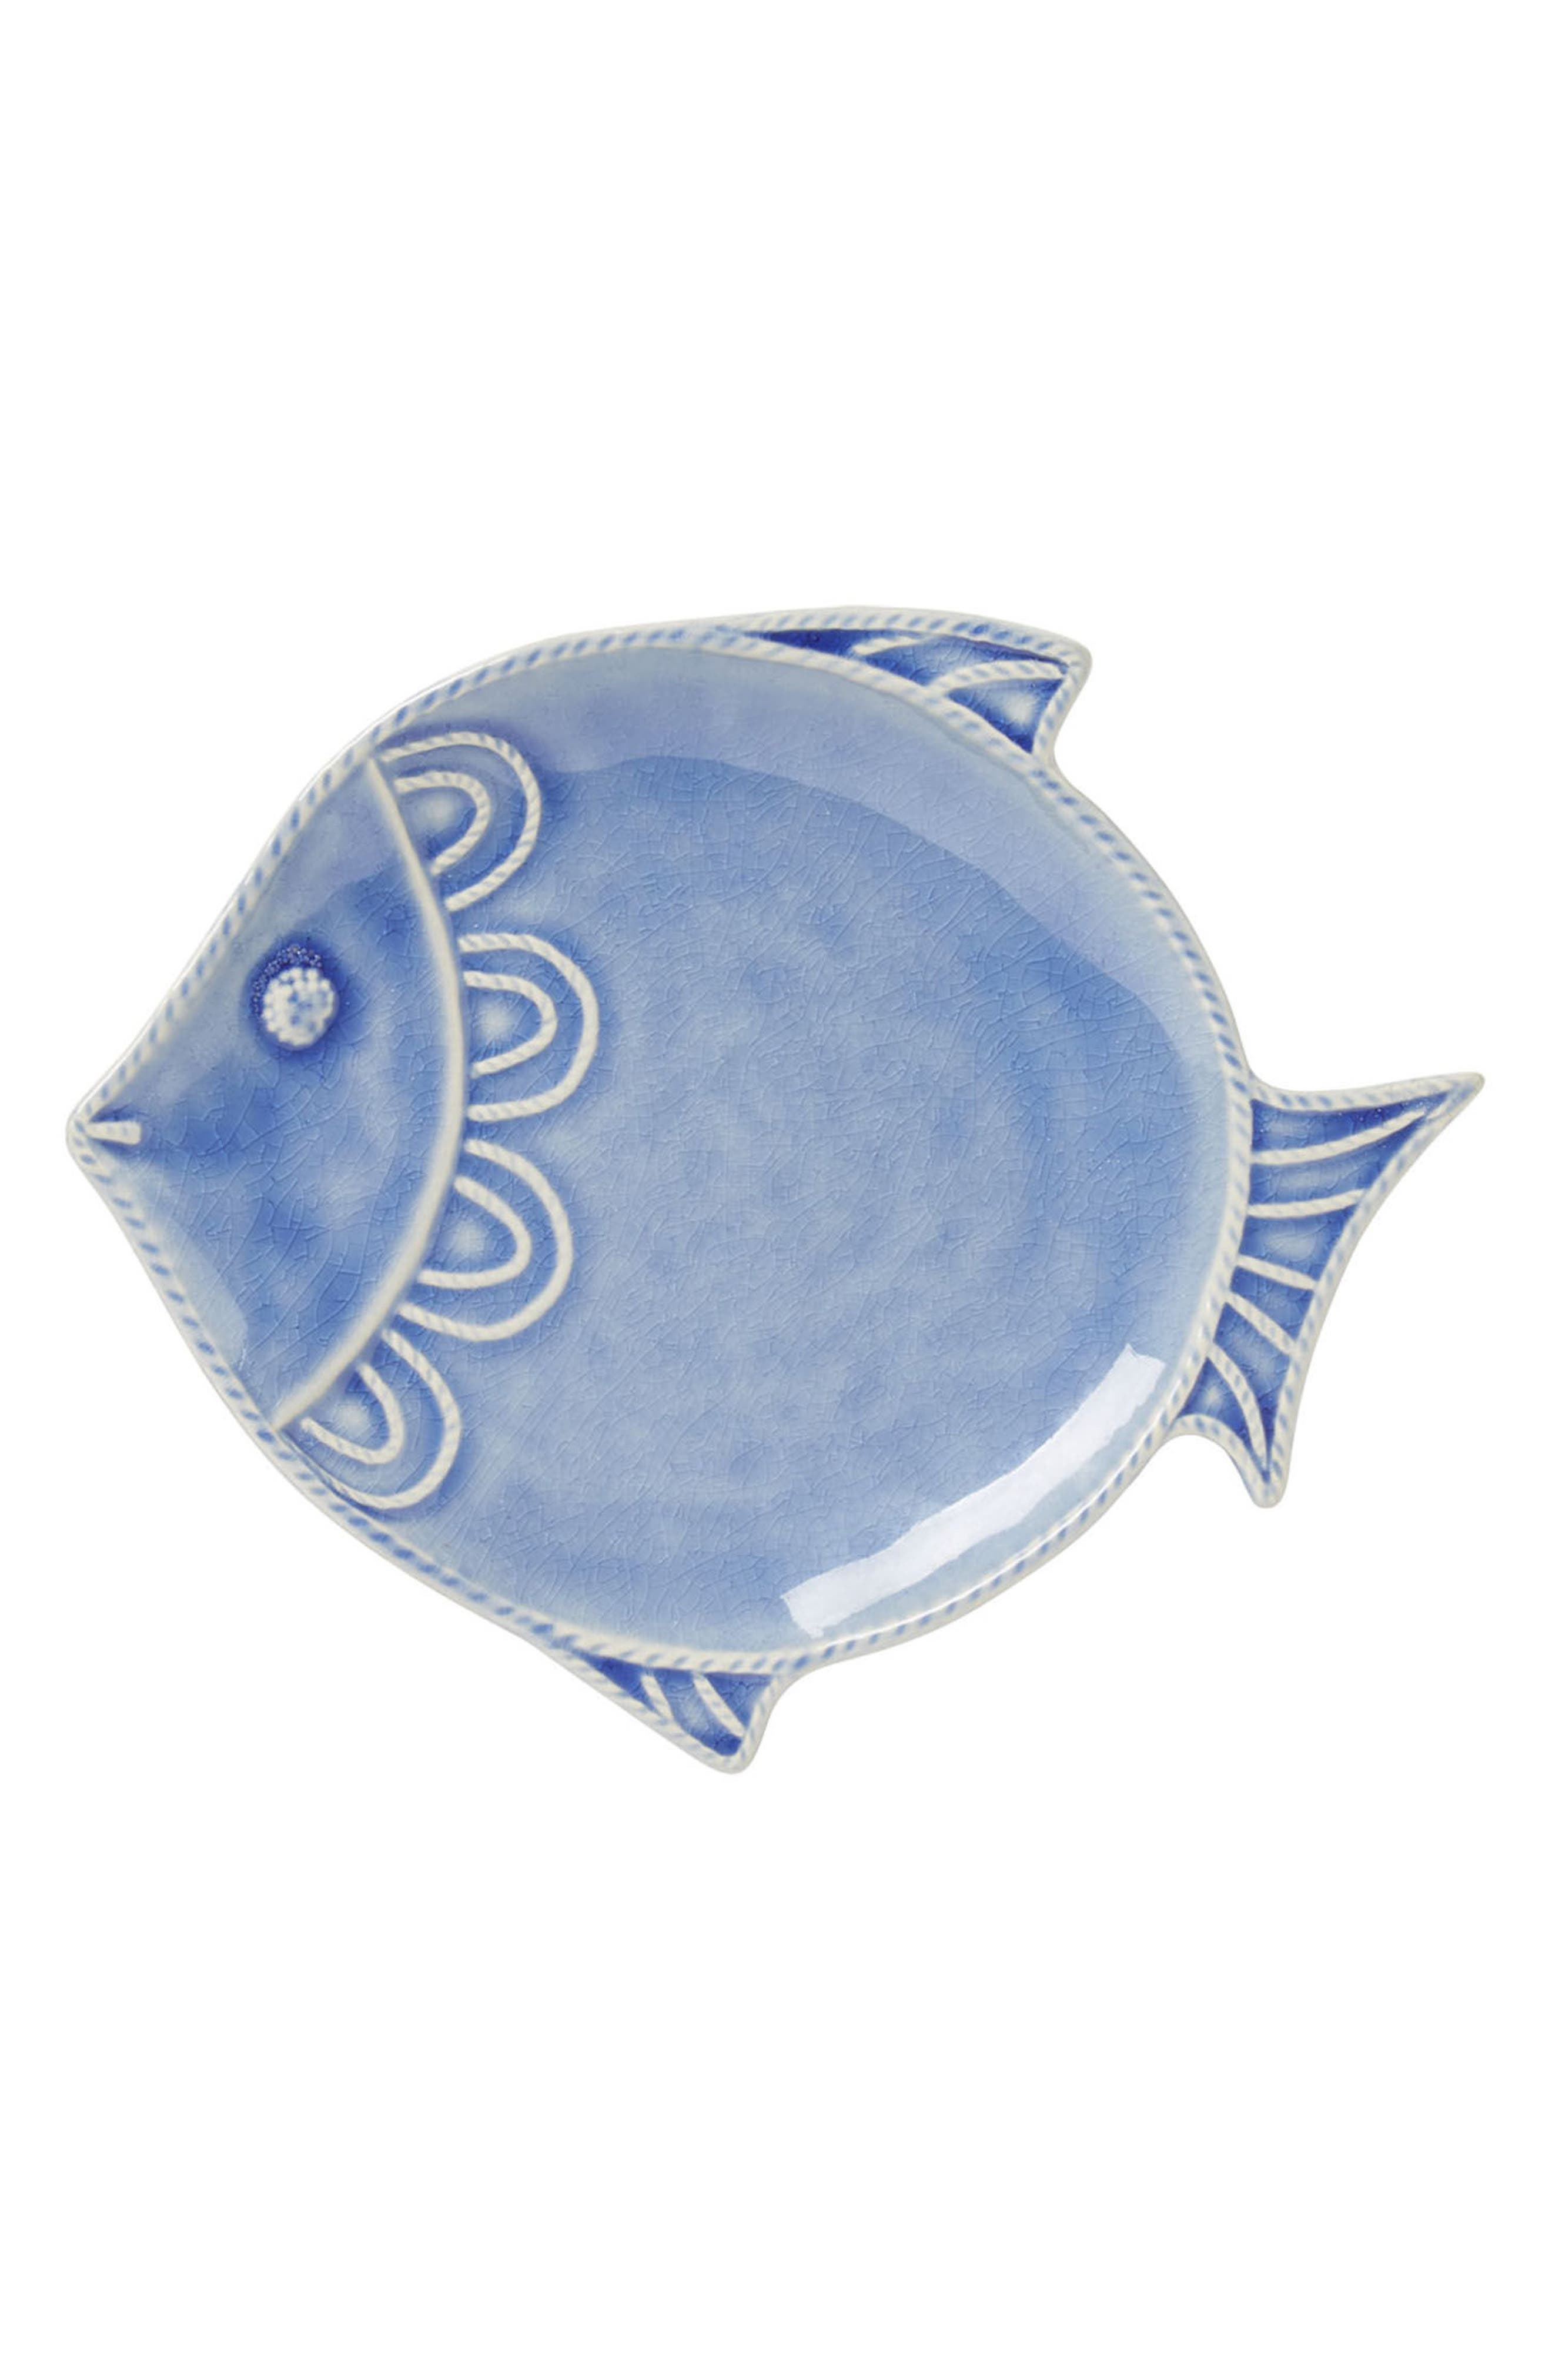 Juliska Berry & Thread Ceramic Fish Plate